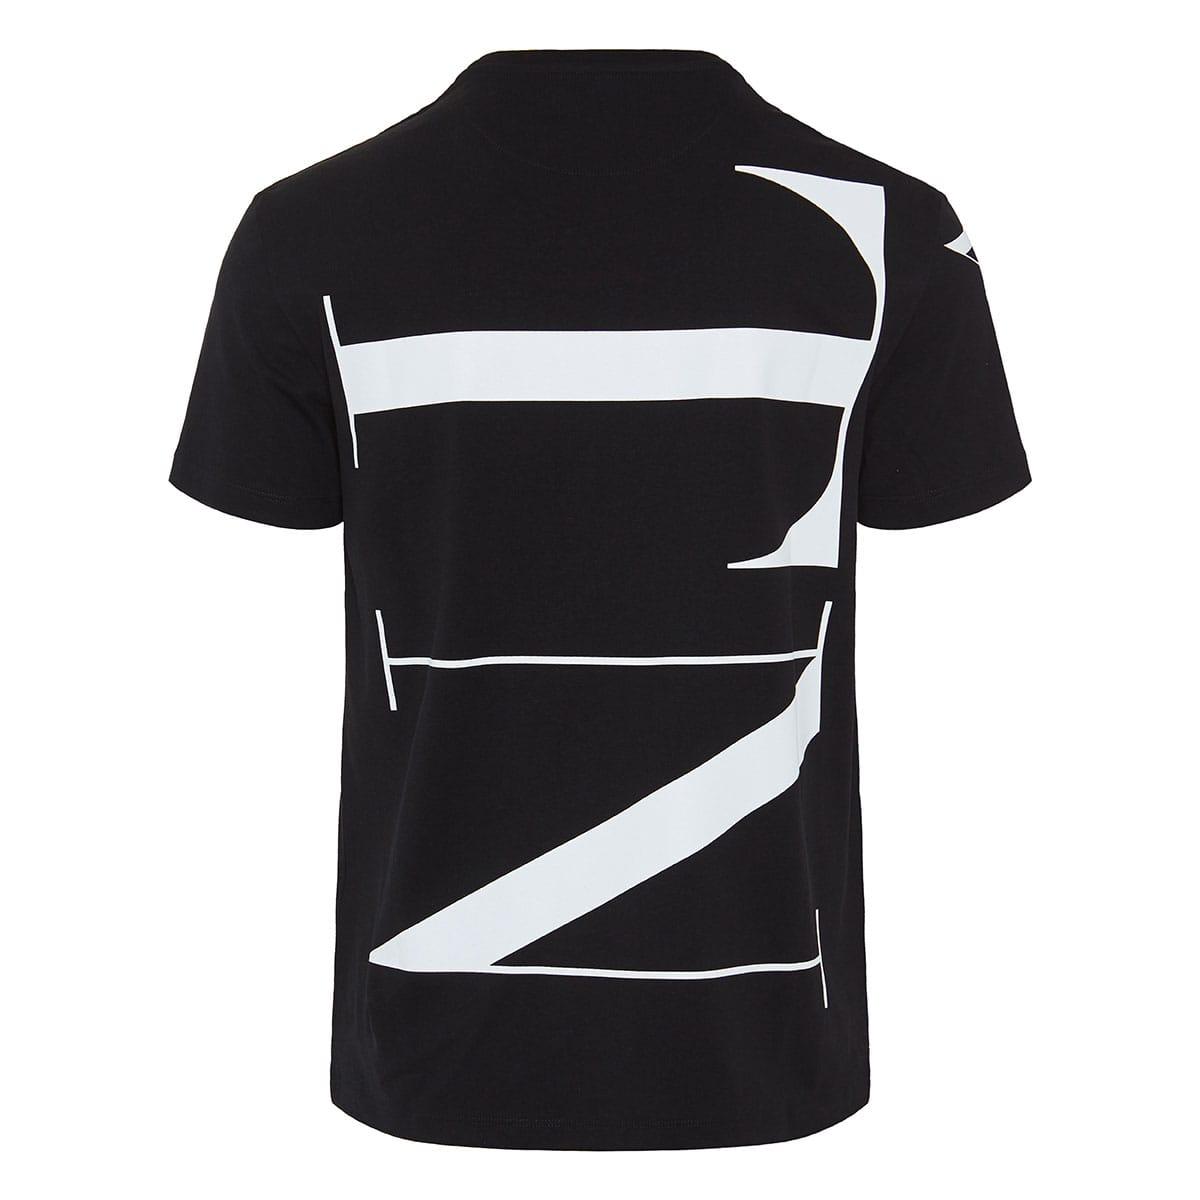 VLTN Star t-shirt